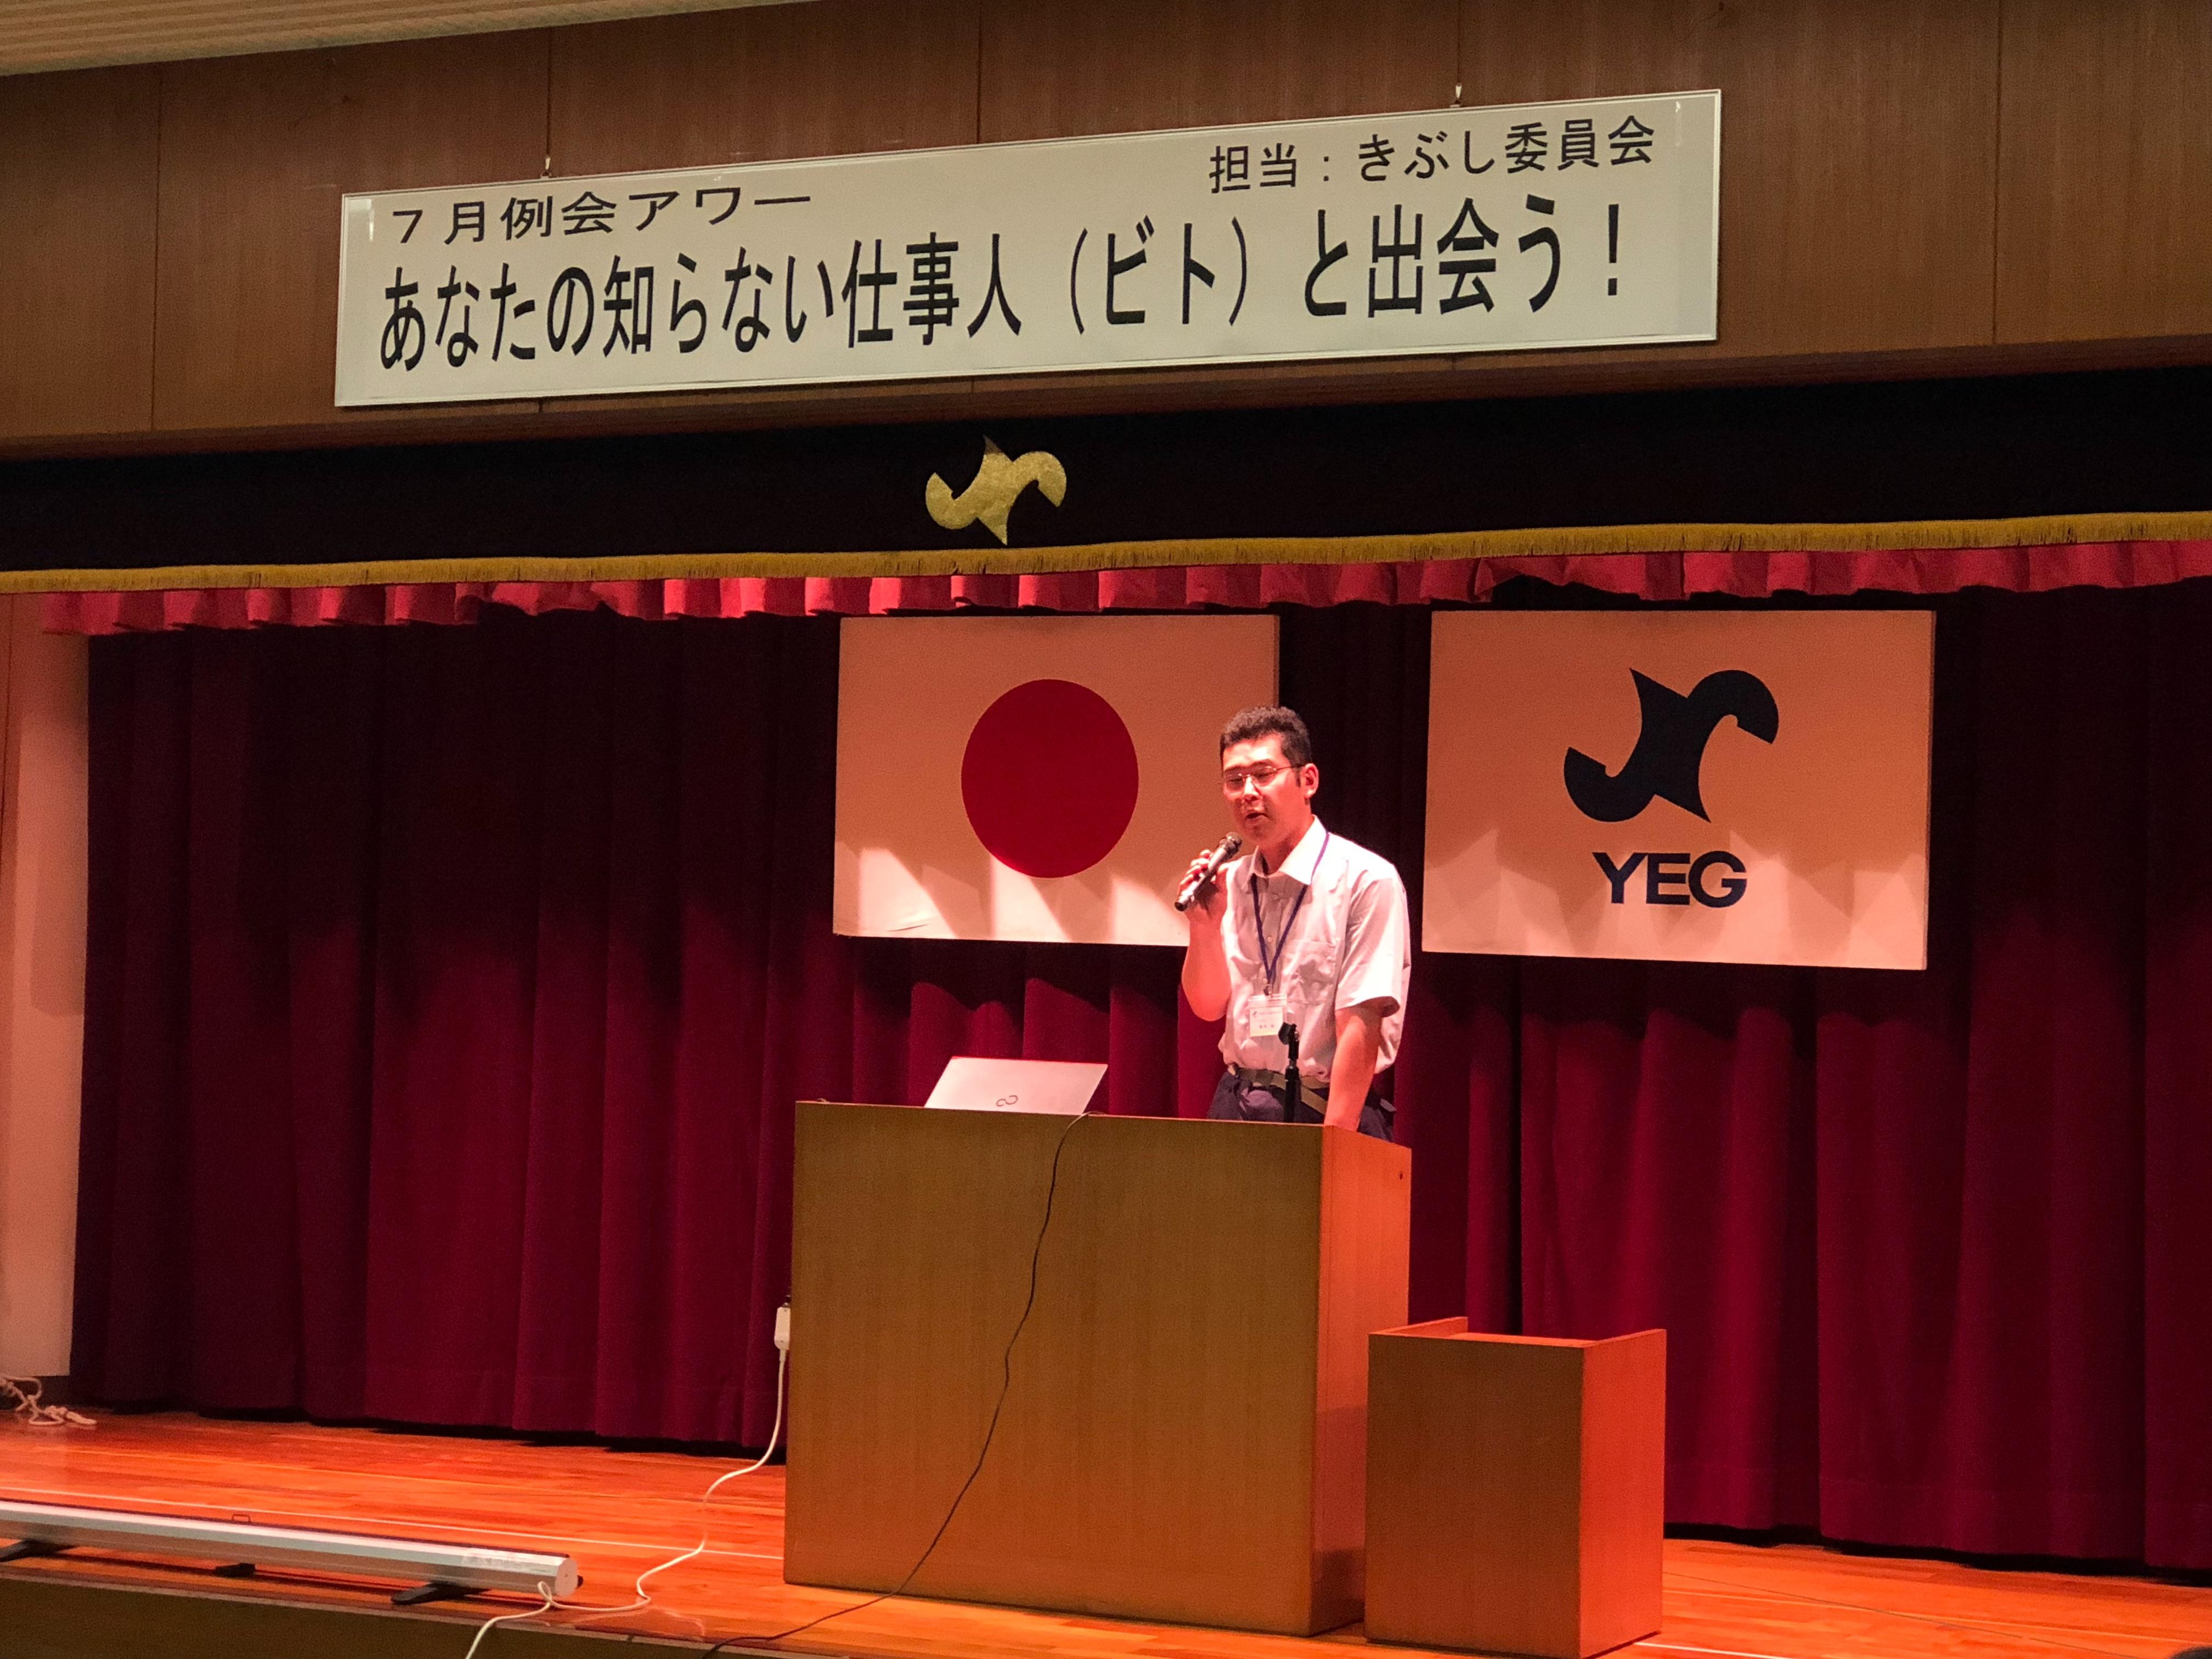 f:id:masanori-kato1972:20190329183616j:image